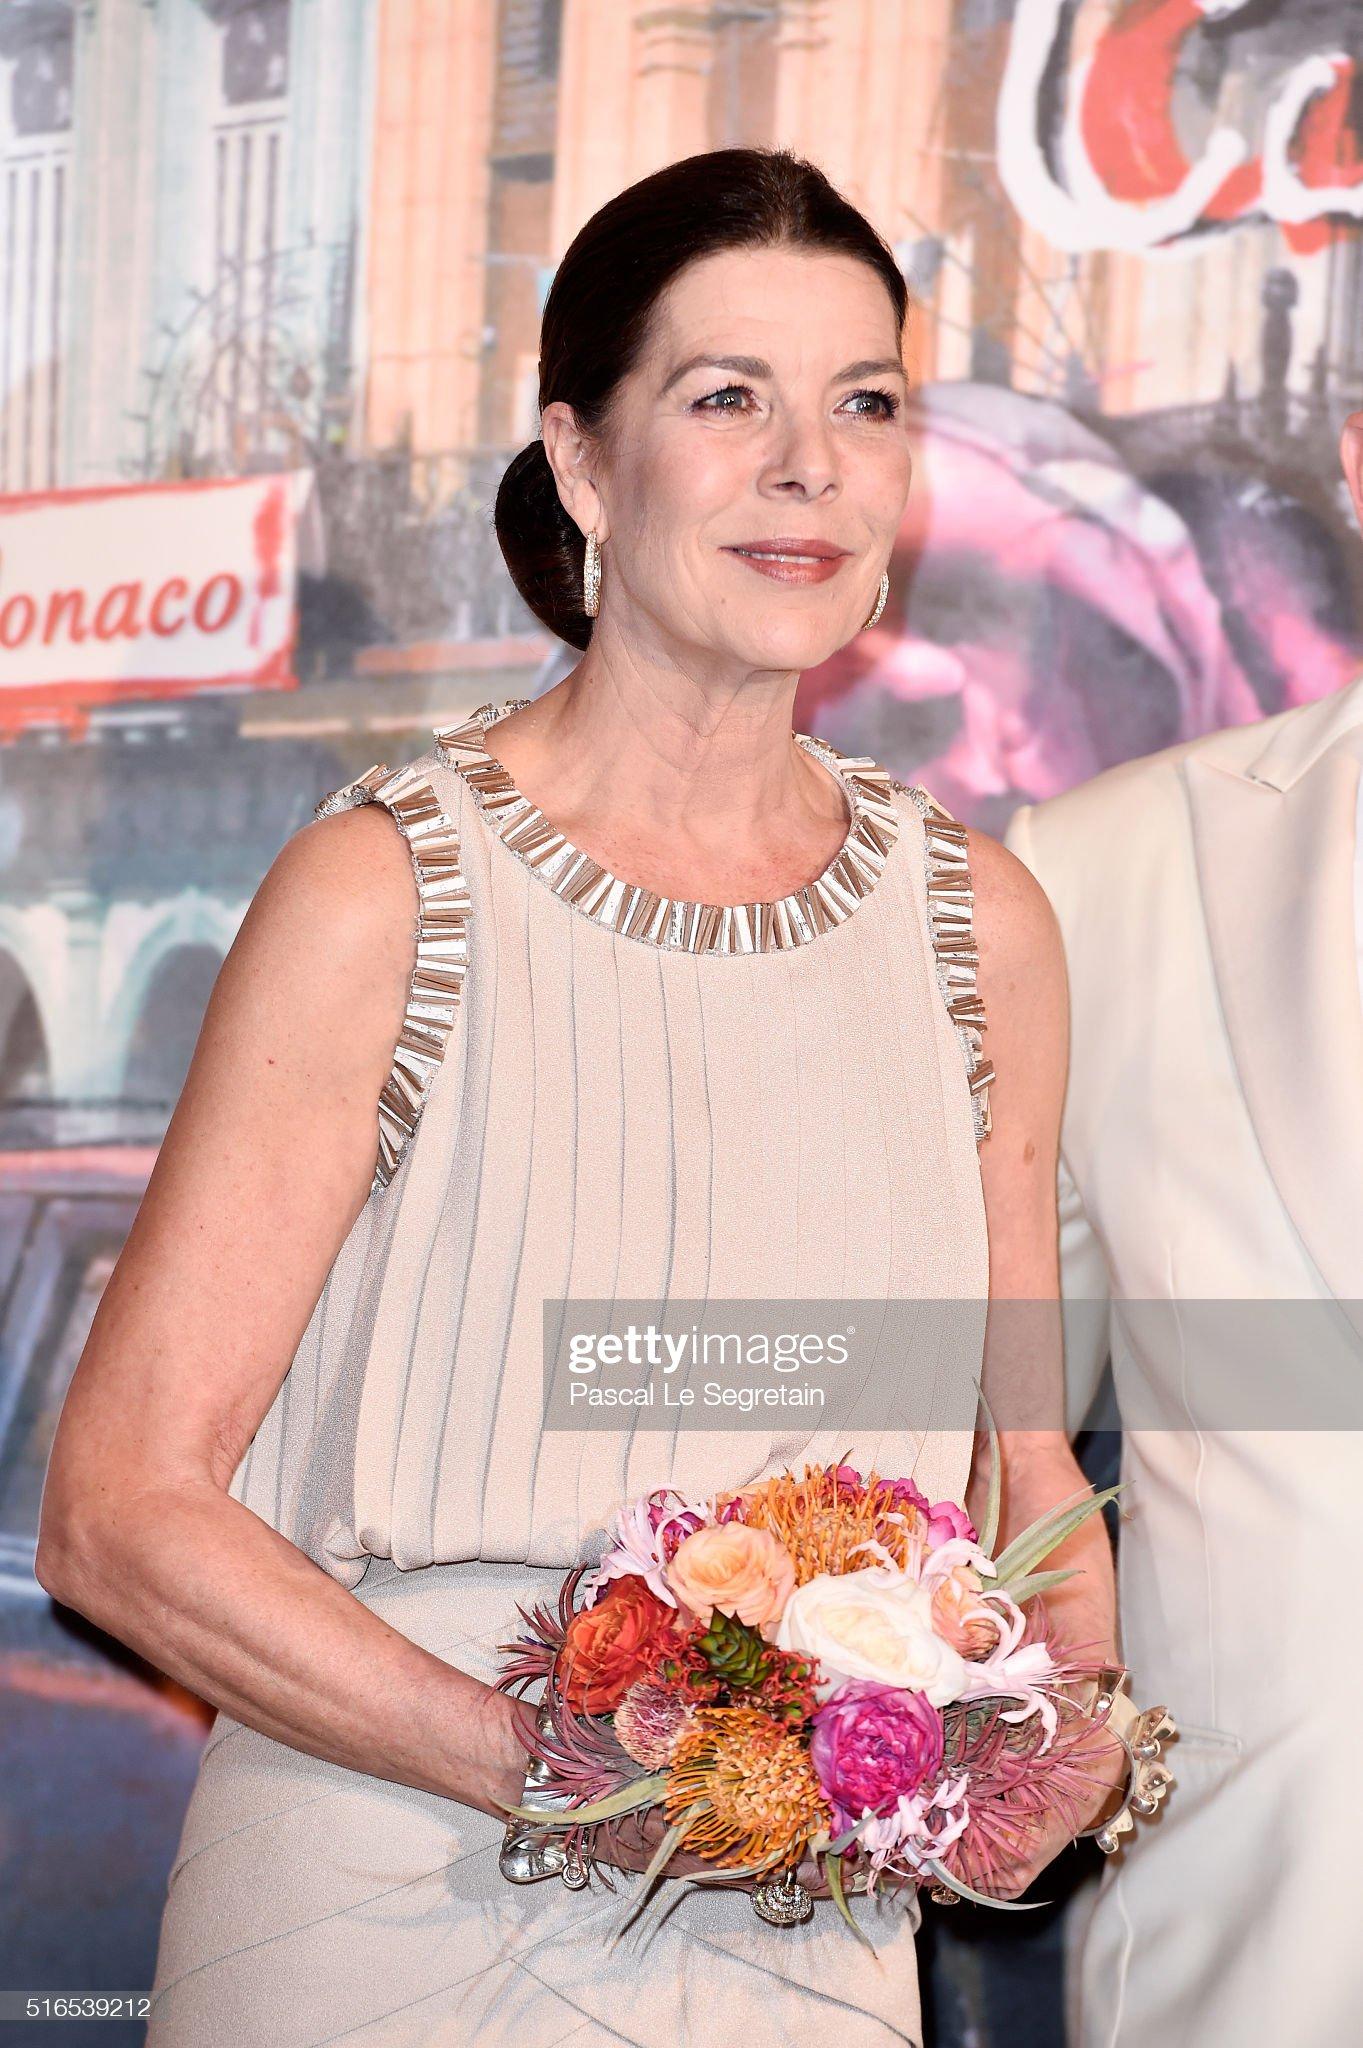 Вечерние наряды Принцессы Каролины. 62nd Rose Ball To Benefit The Princess Grace Foundation In Monte-Carlo : News Photo